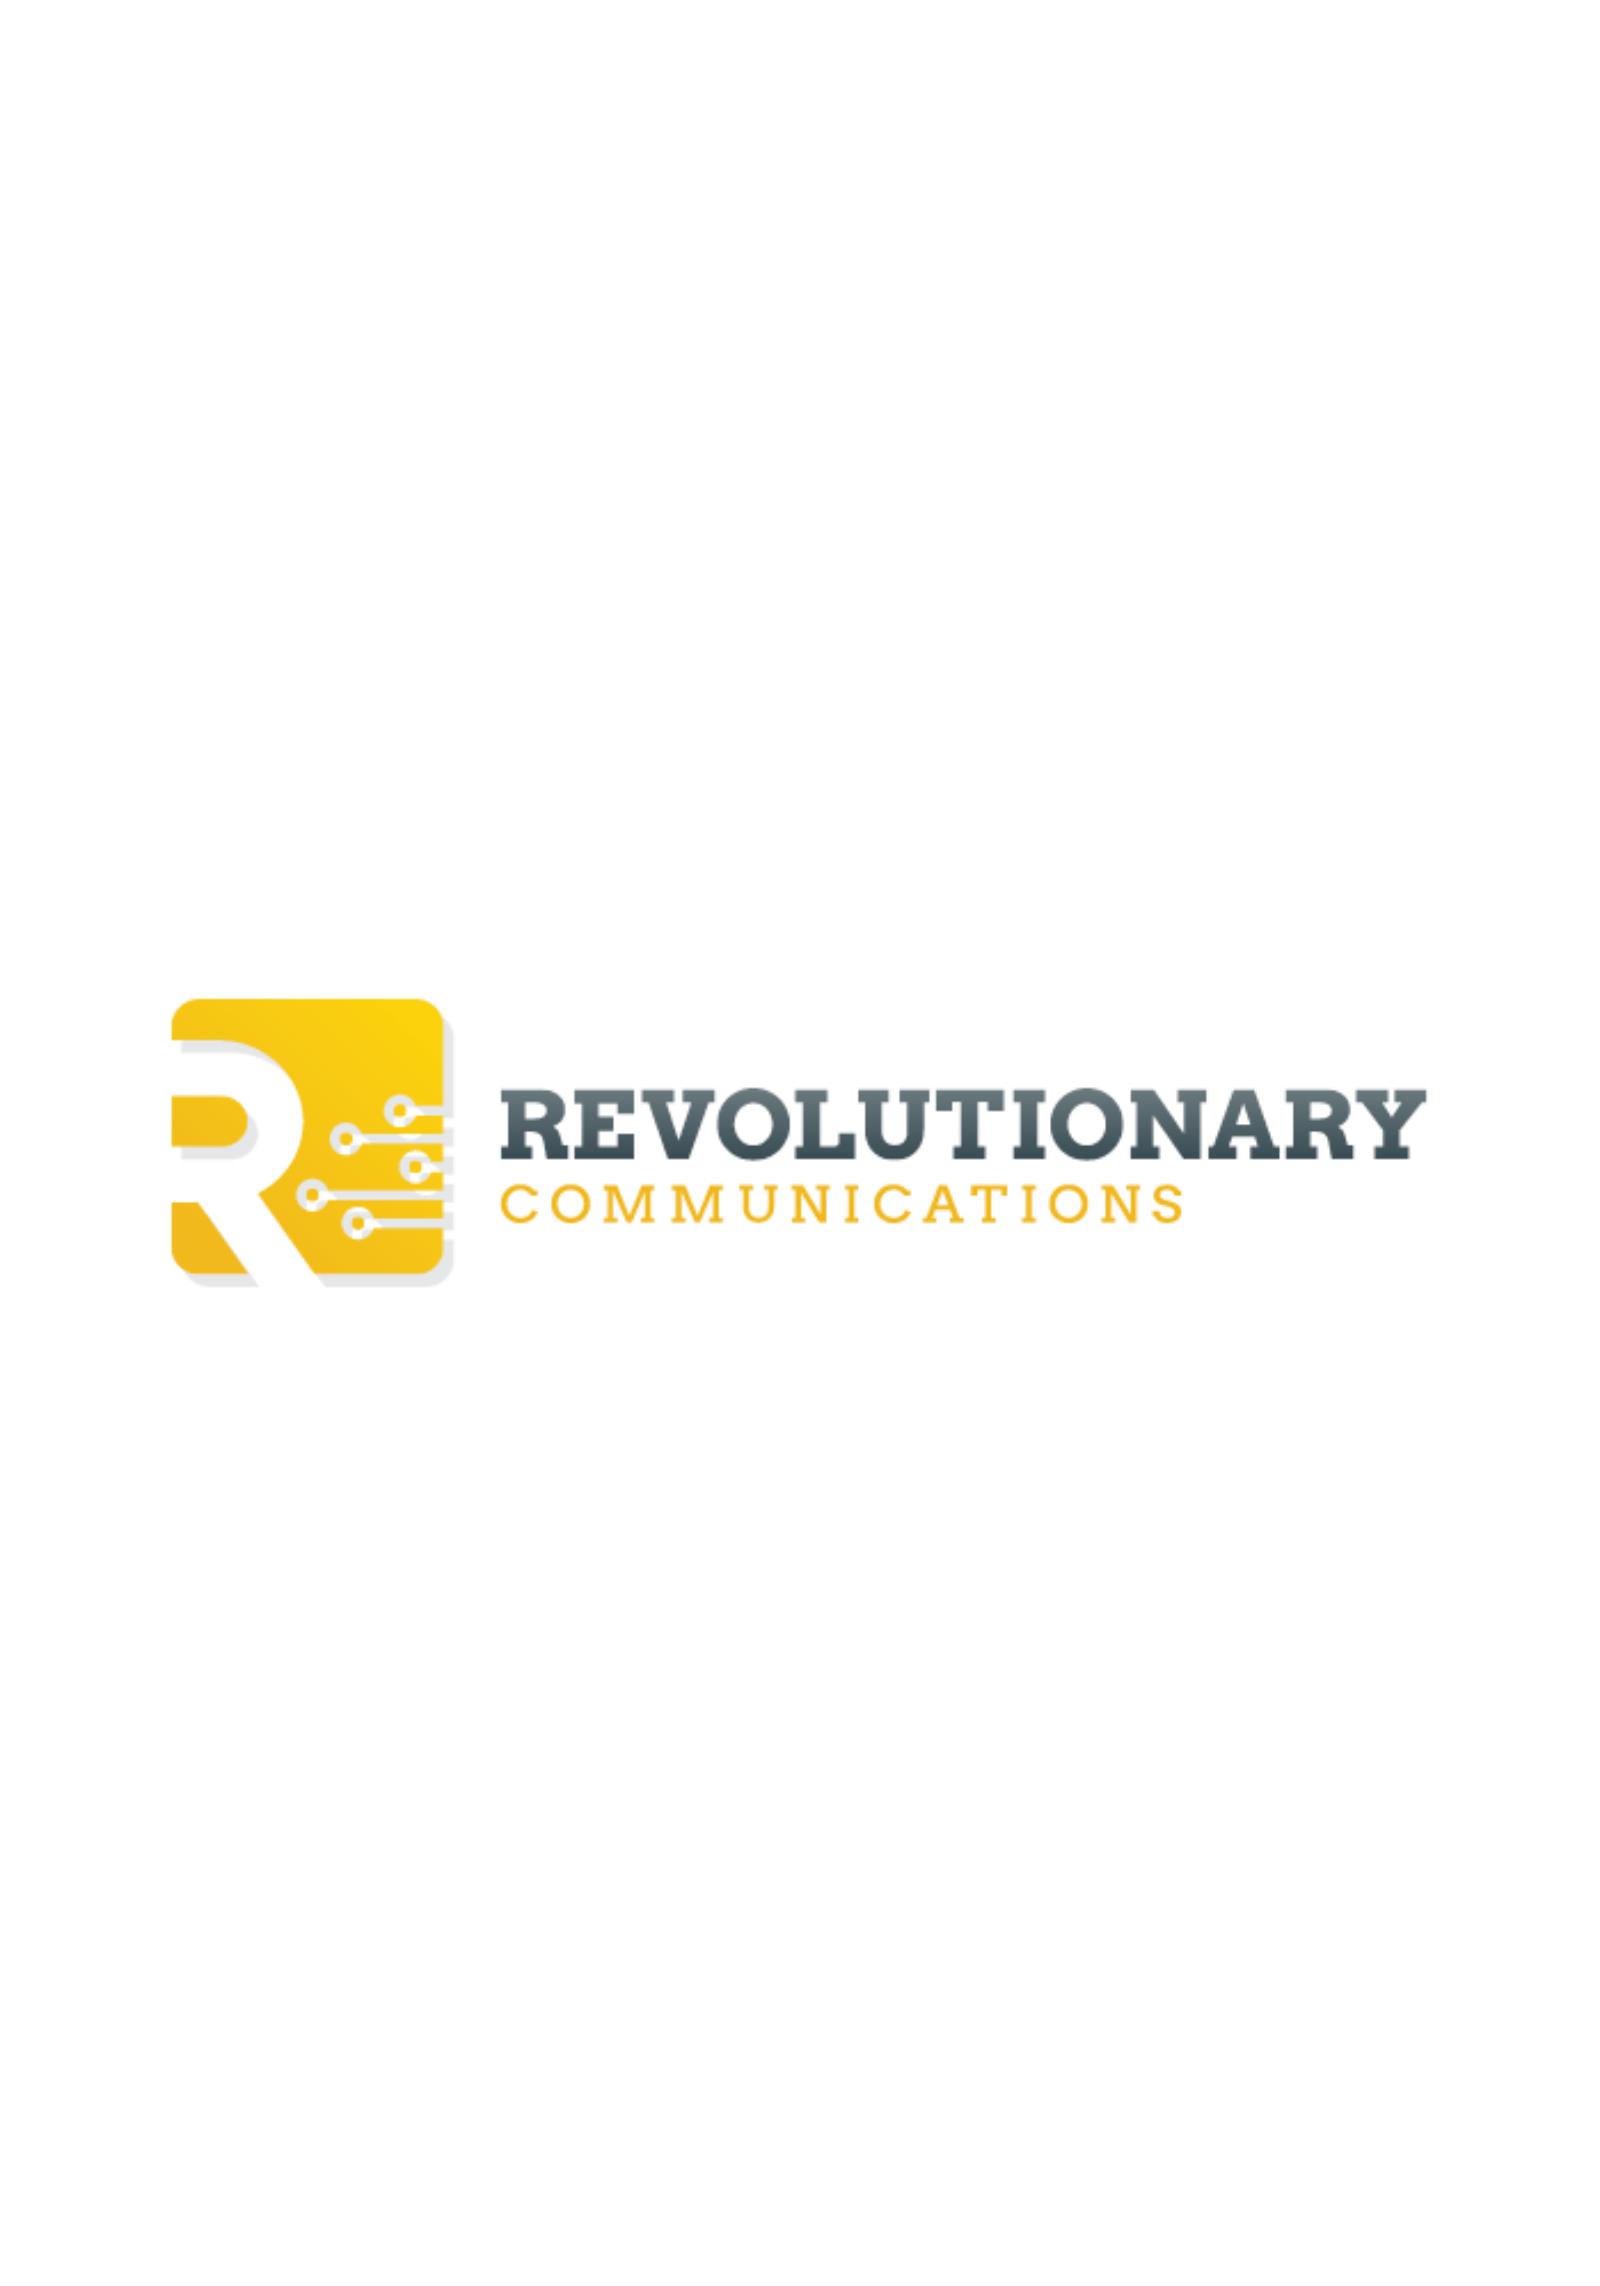 Revolutionary Communications